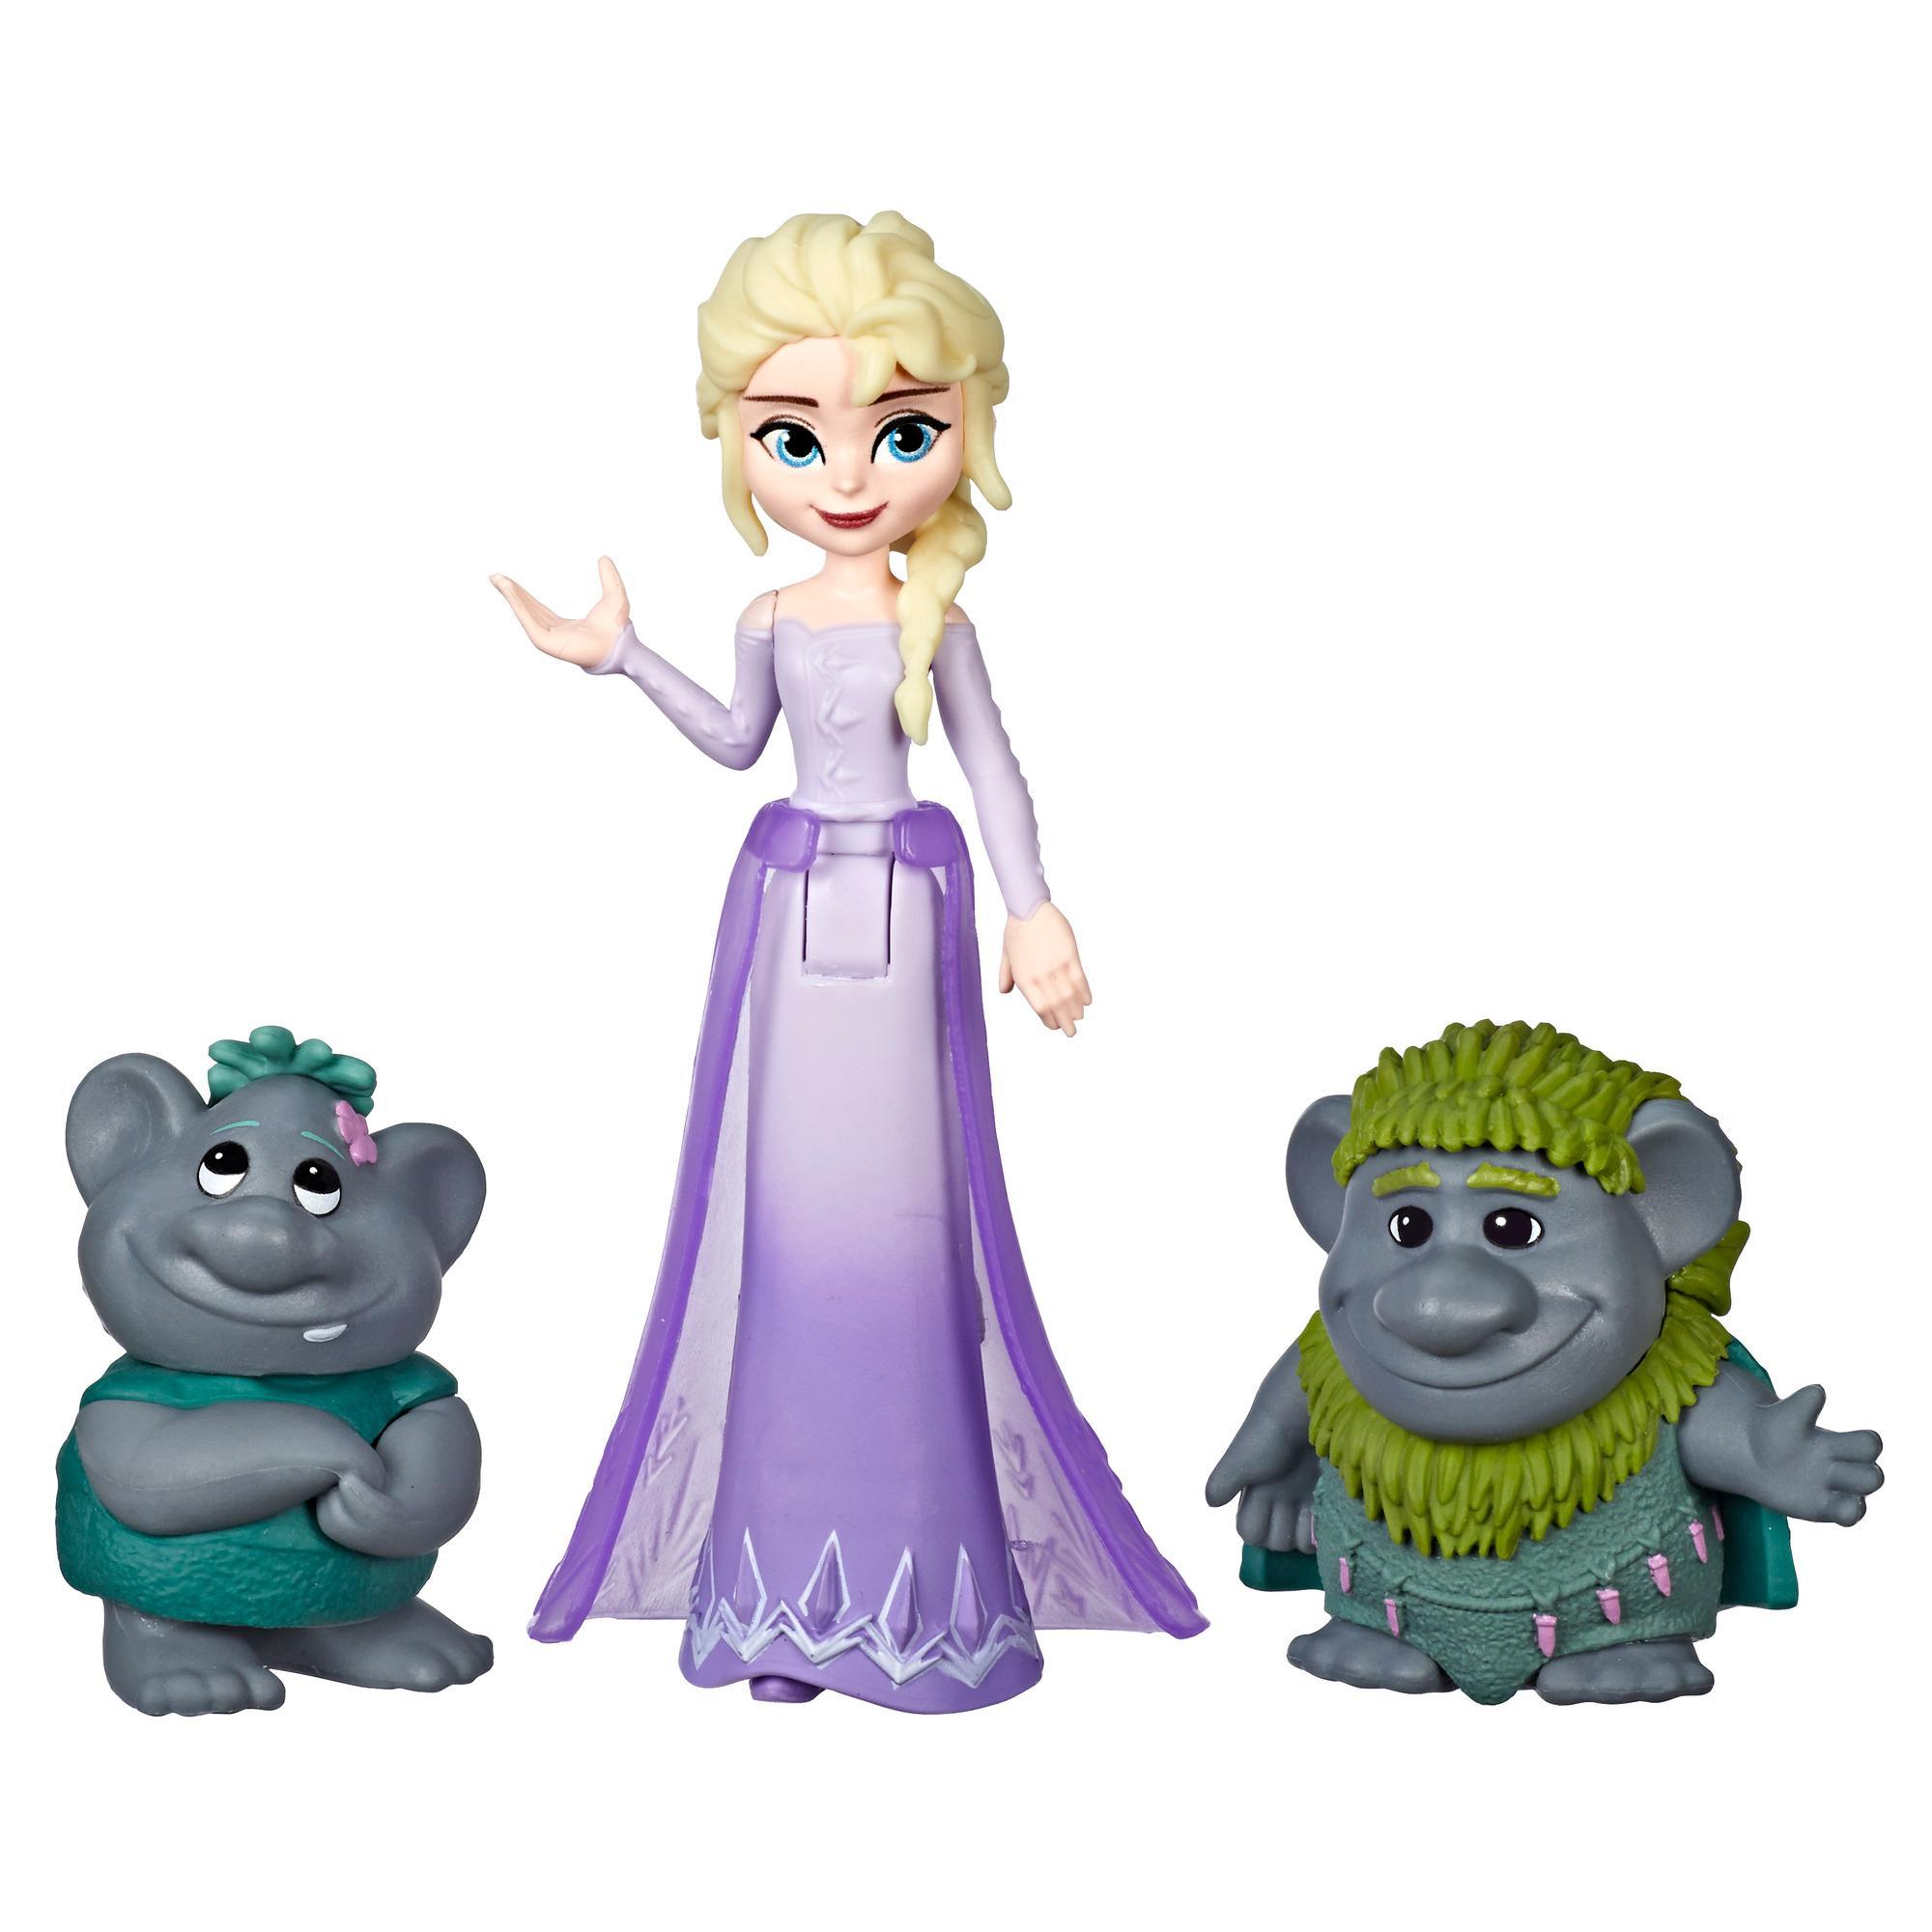 Frozen 2, Μικρή φιγούρα Έλσας με καλικάντζαρους